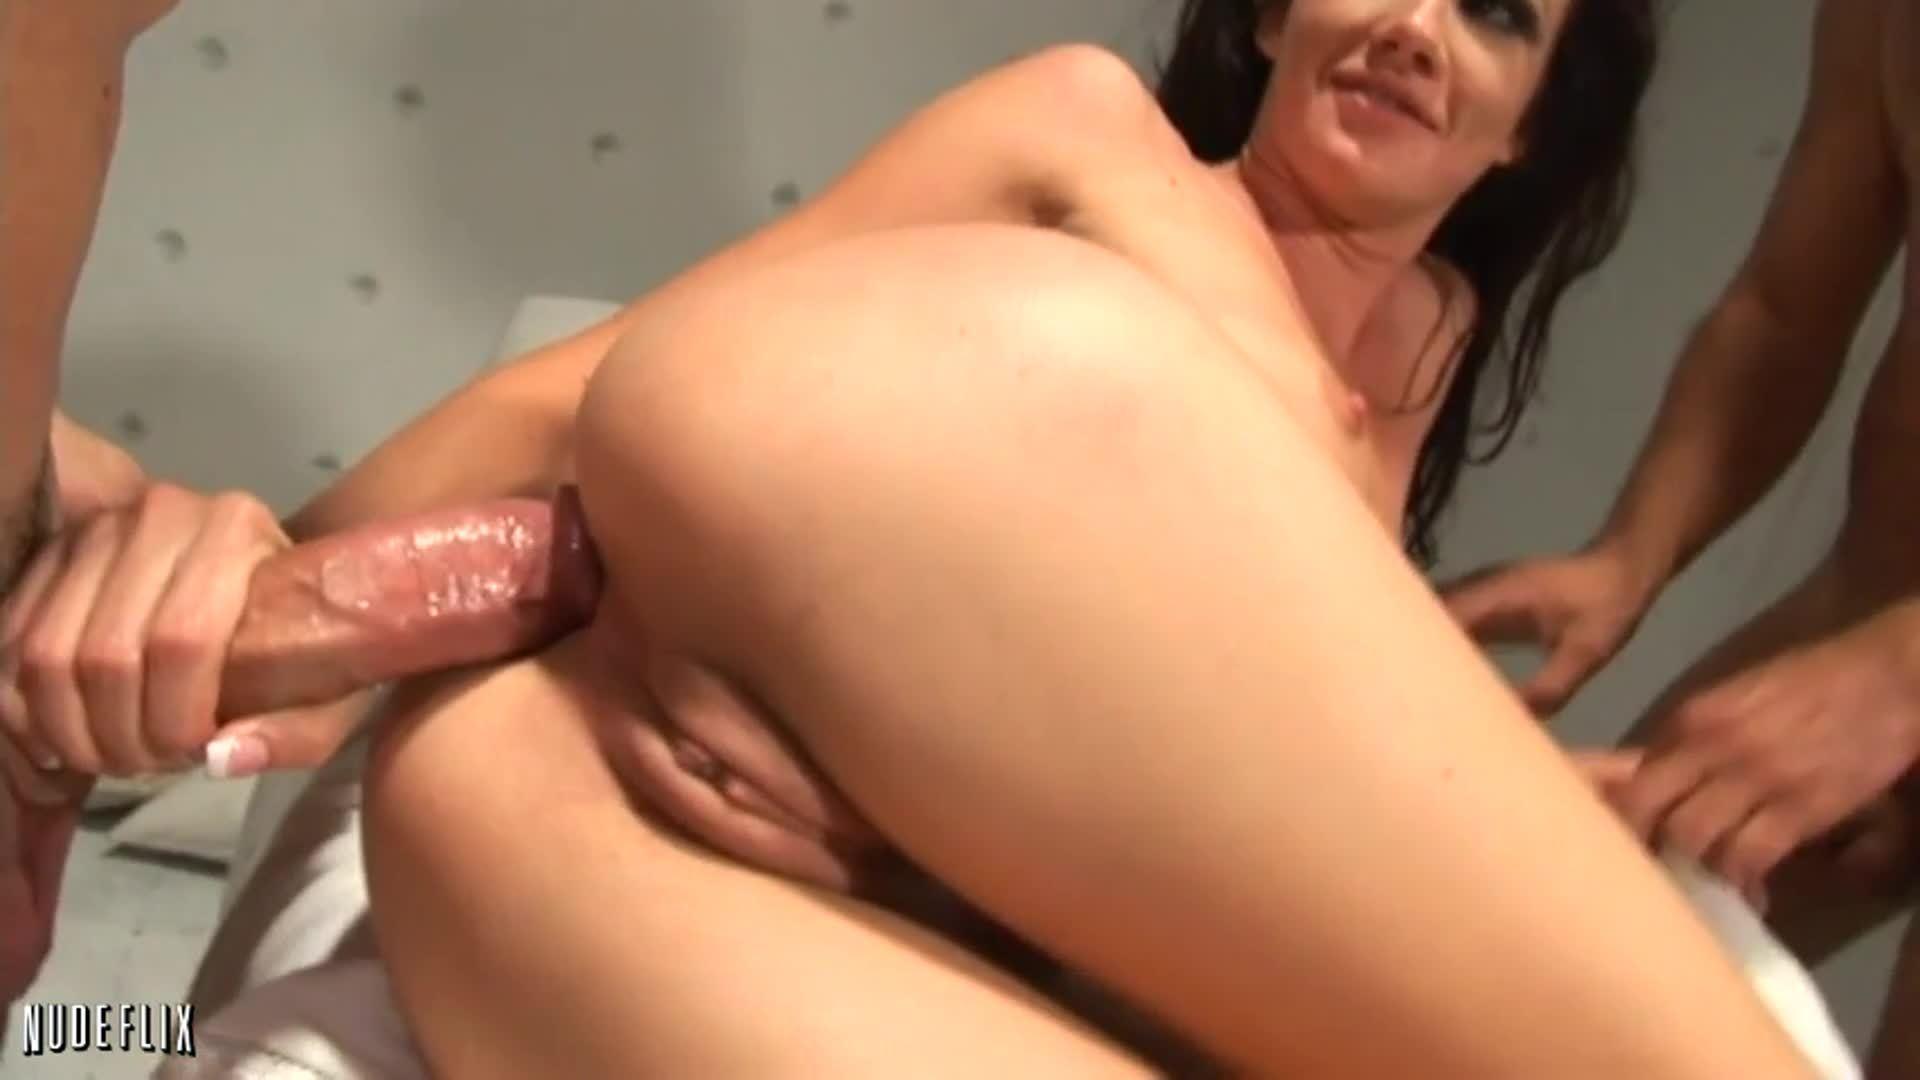 Riesen penis ficken